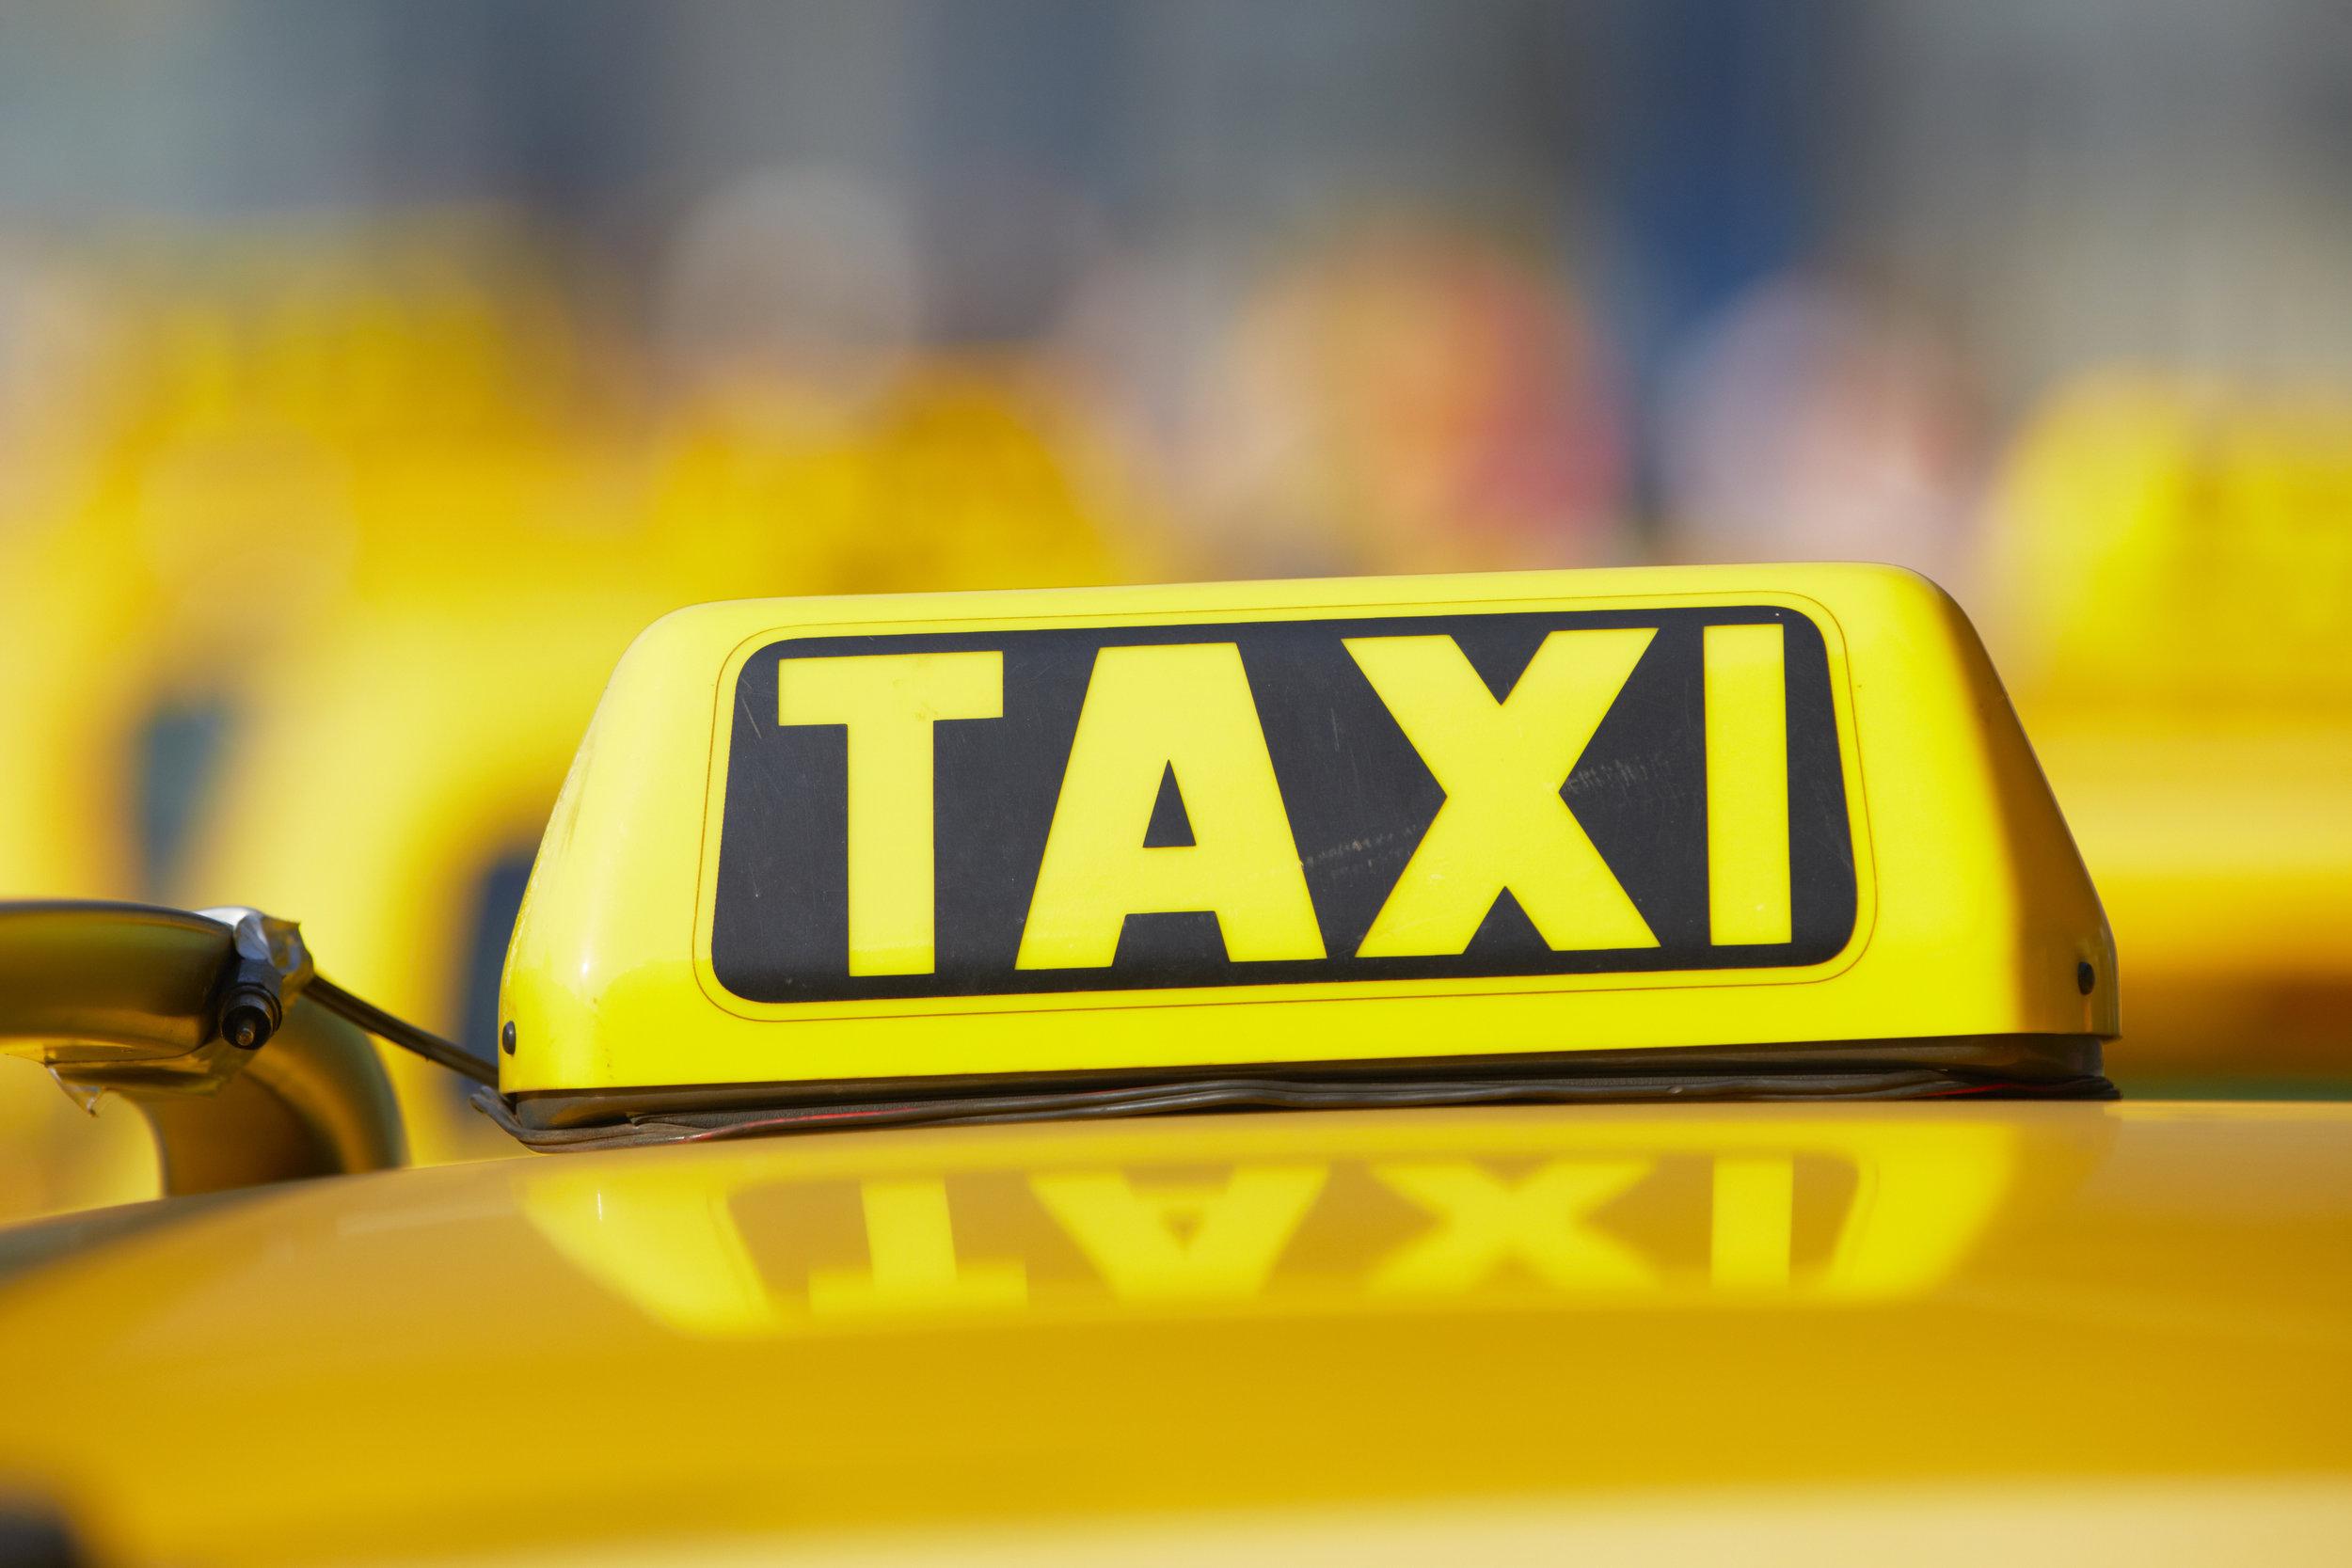 033840500-taxi.jpeg